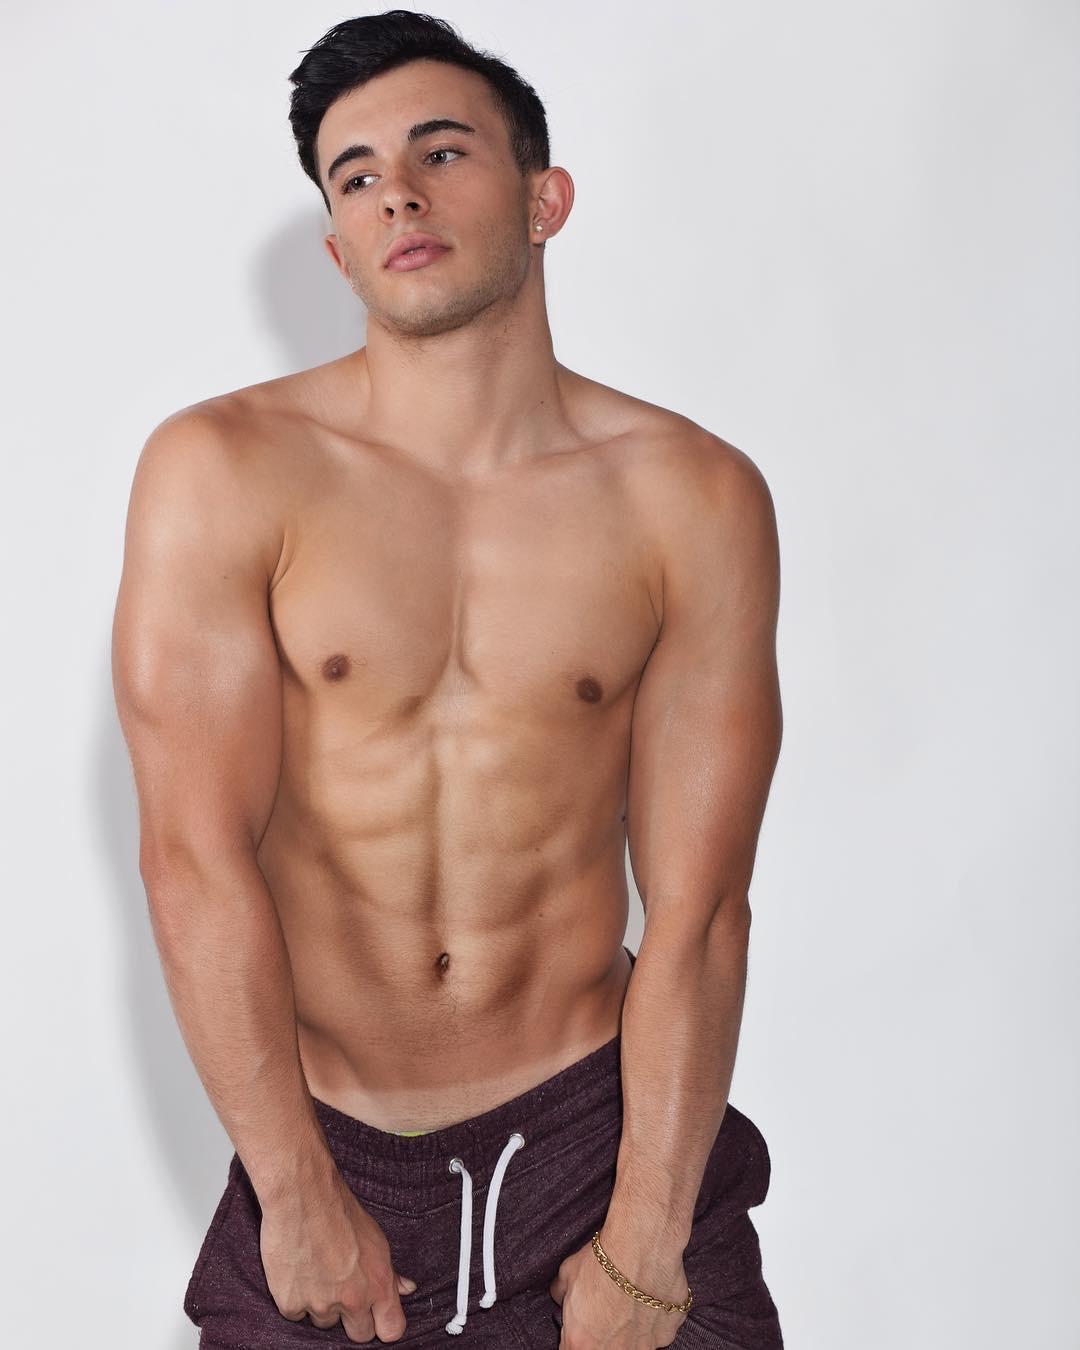 Anthony Stefanelli Gay LA Gymnast Influencer 4